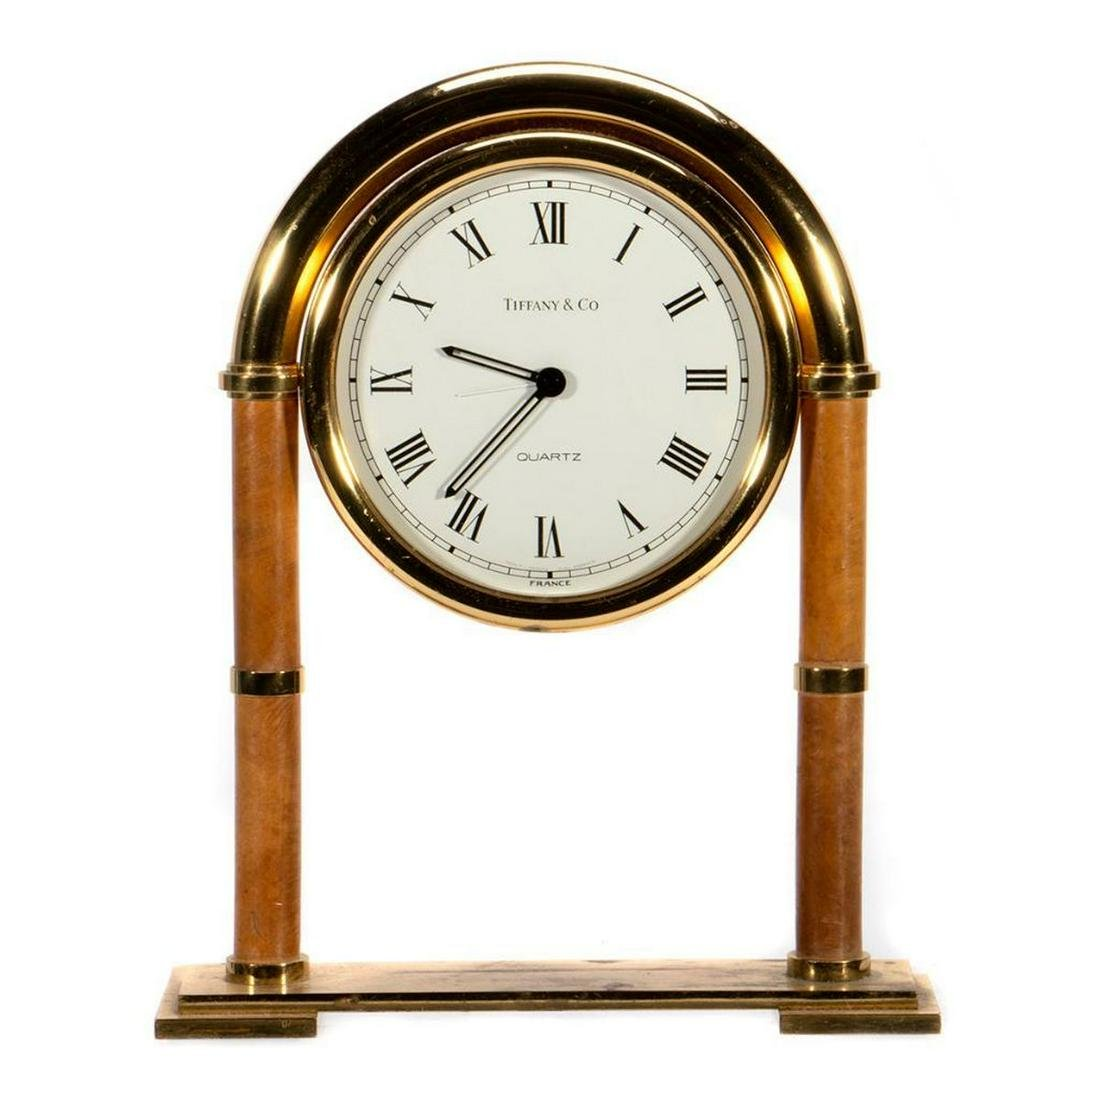 Tiffany & Co. Brass Desk Mantle Clock - Swiss made